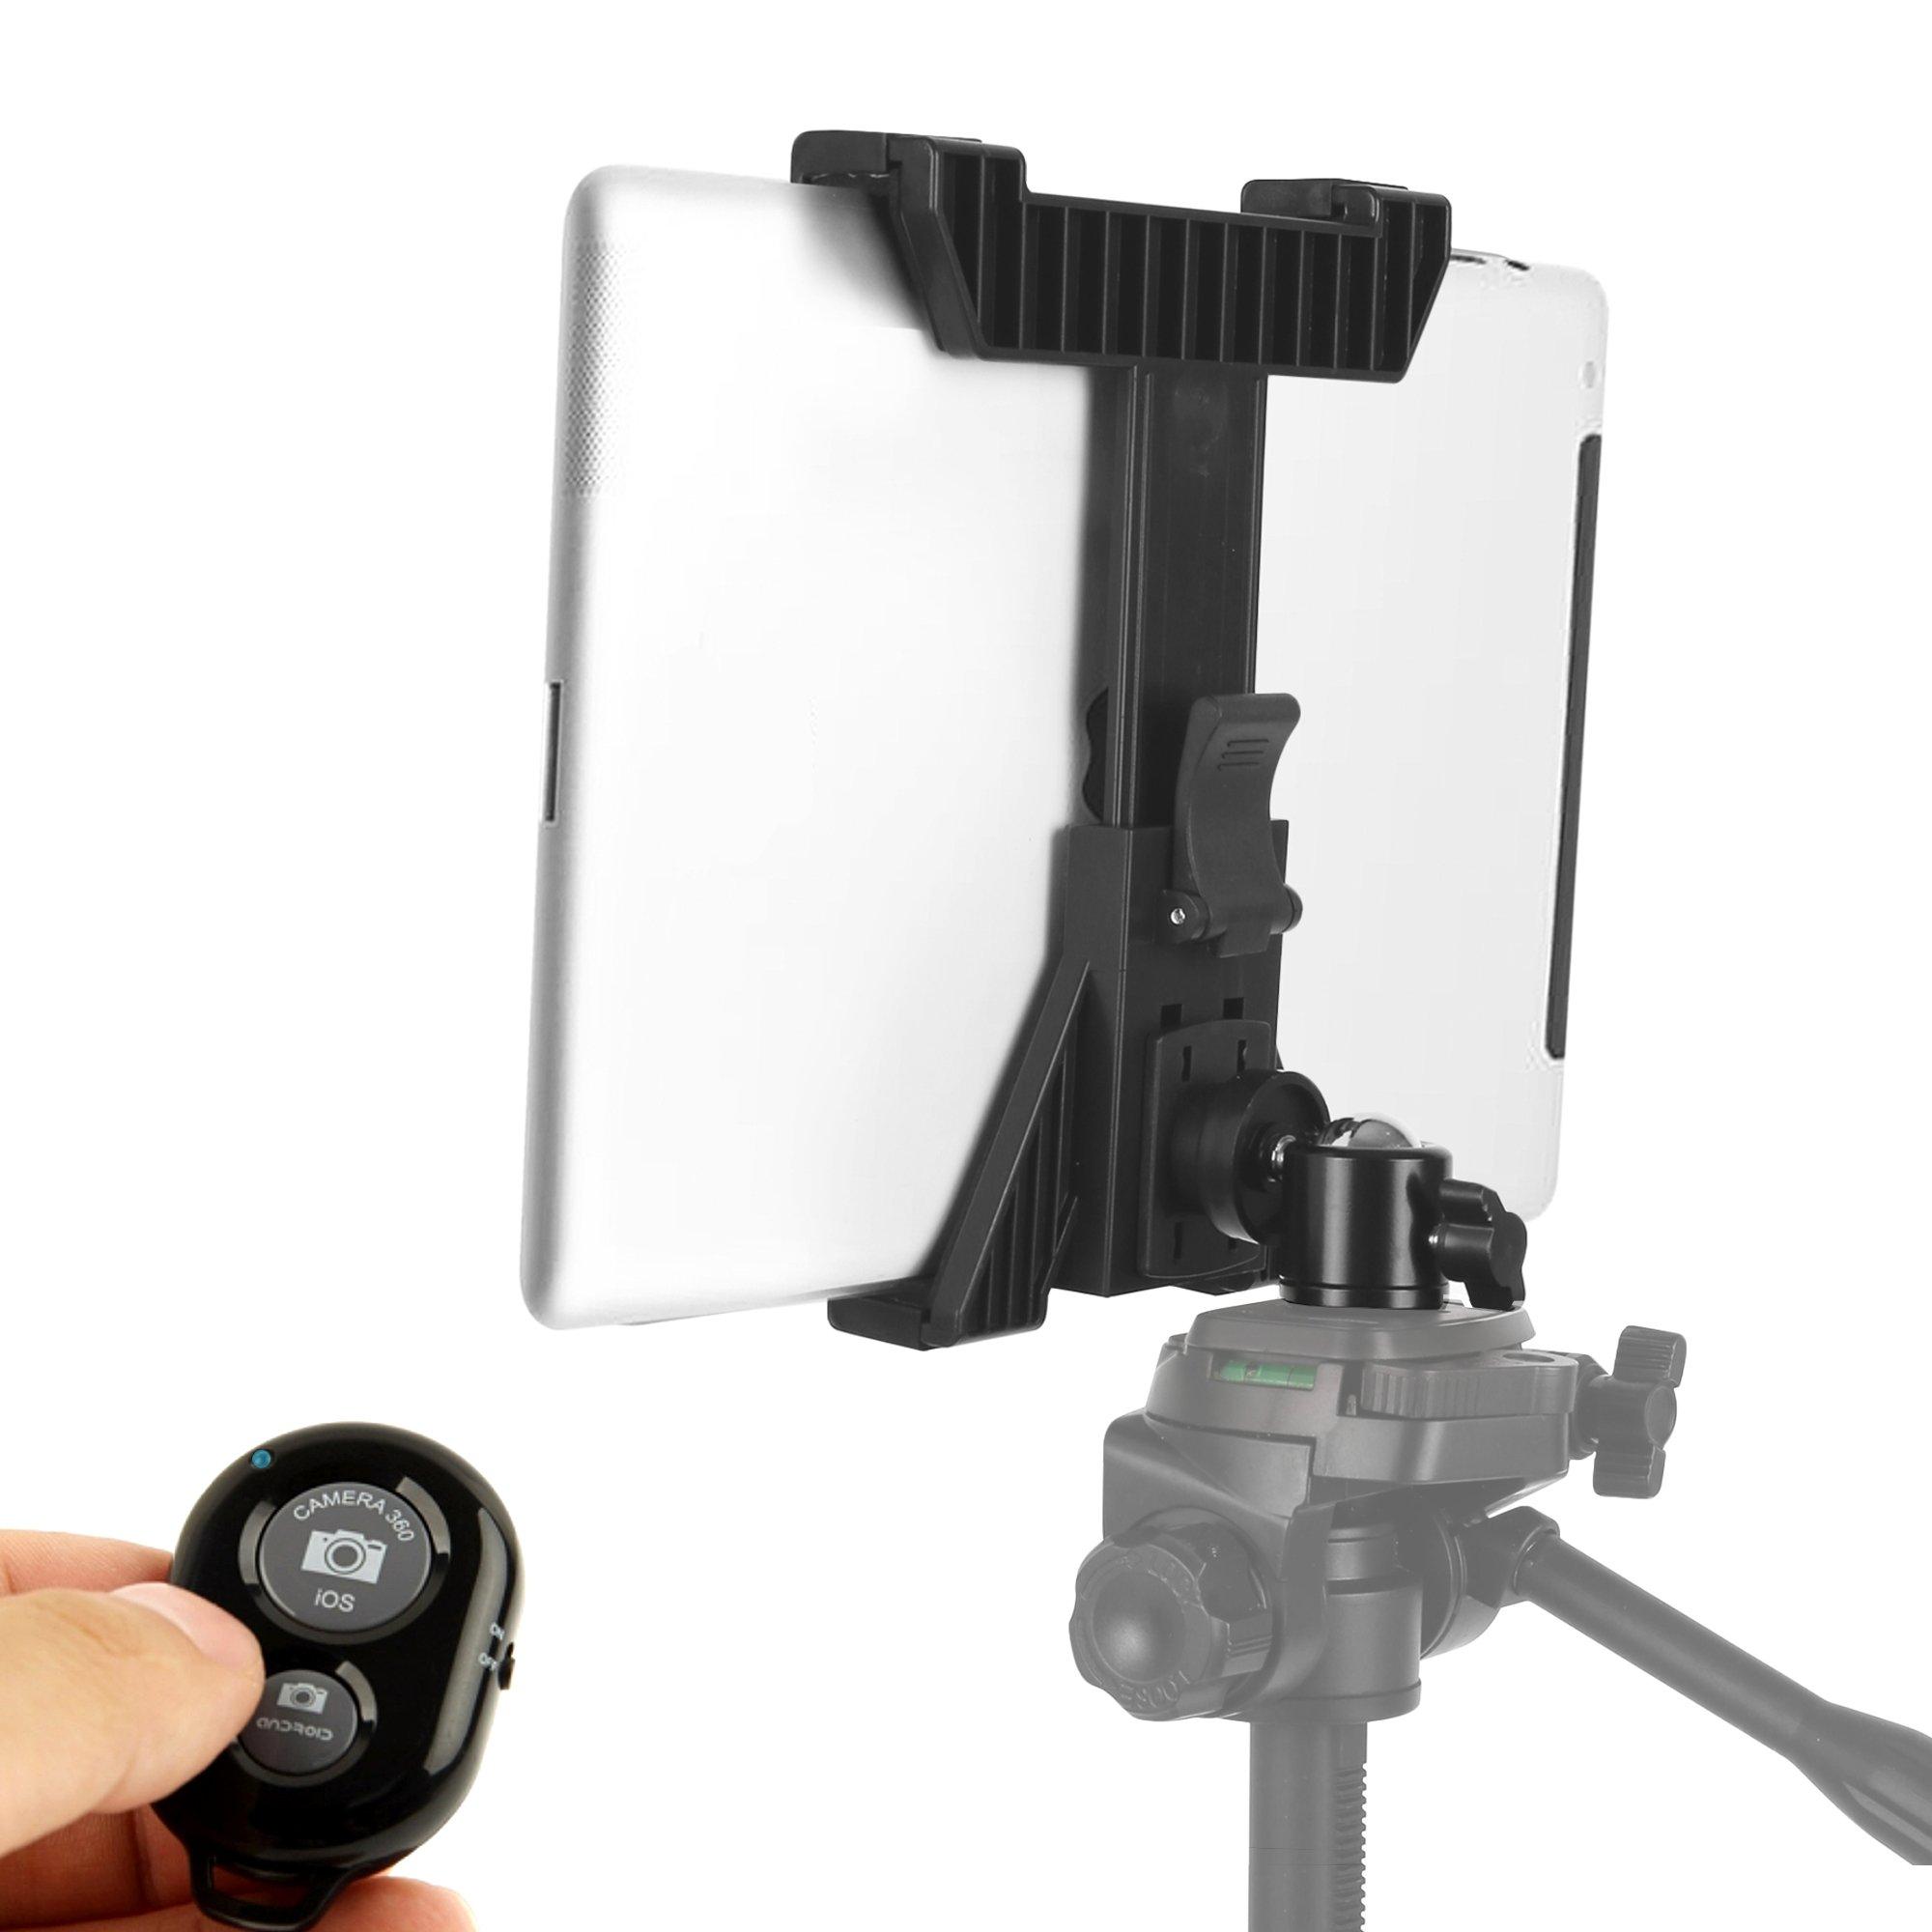 KobraTech iPad Tripod Mount - TabMount 360 - Tablet Tripod Mount with Ball Head & Bluetooth Remote Shutter